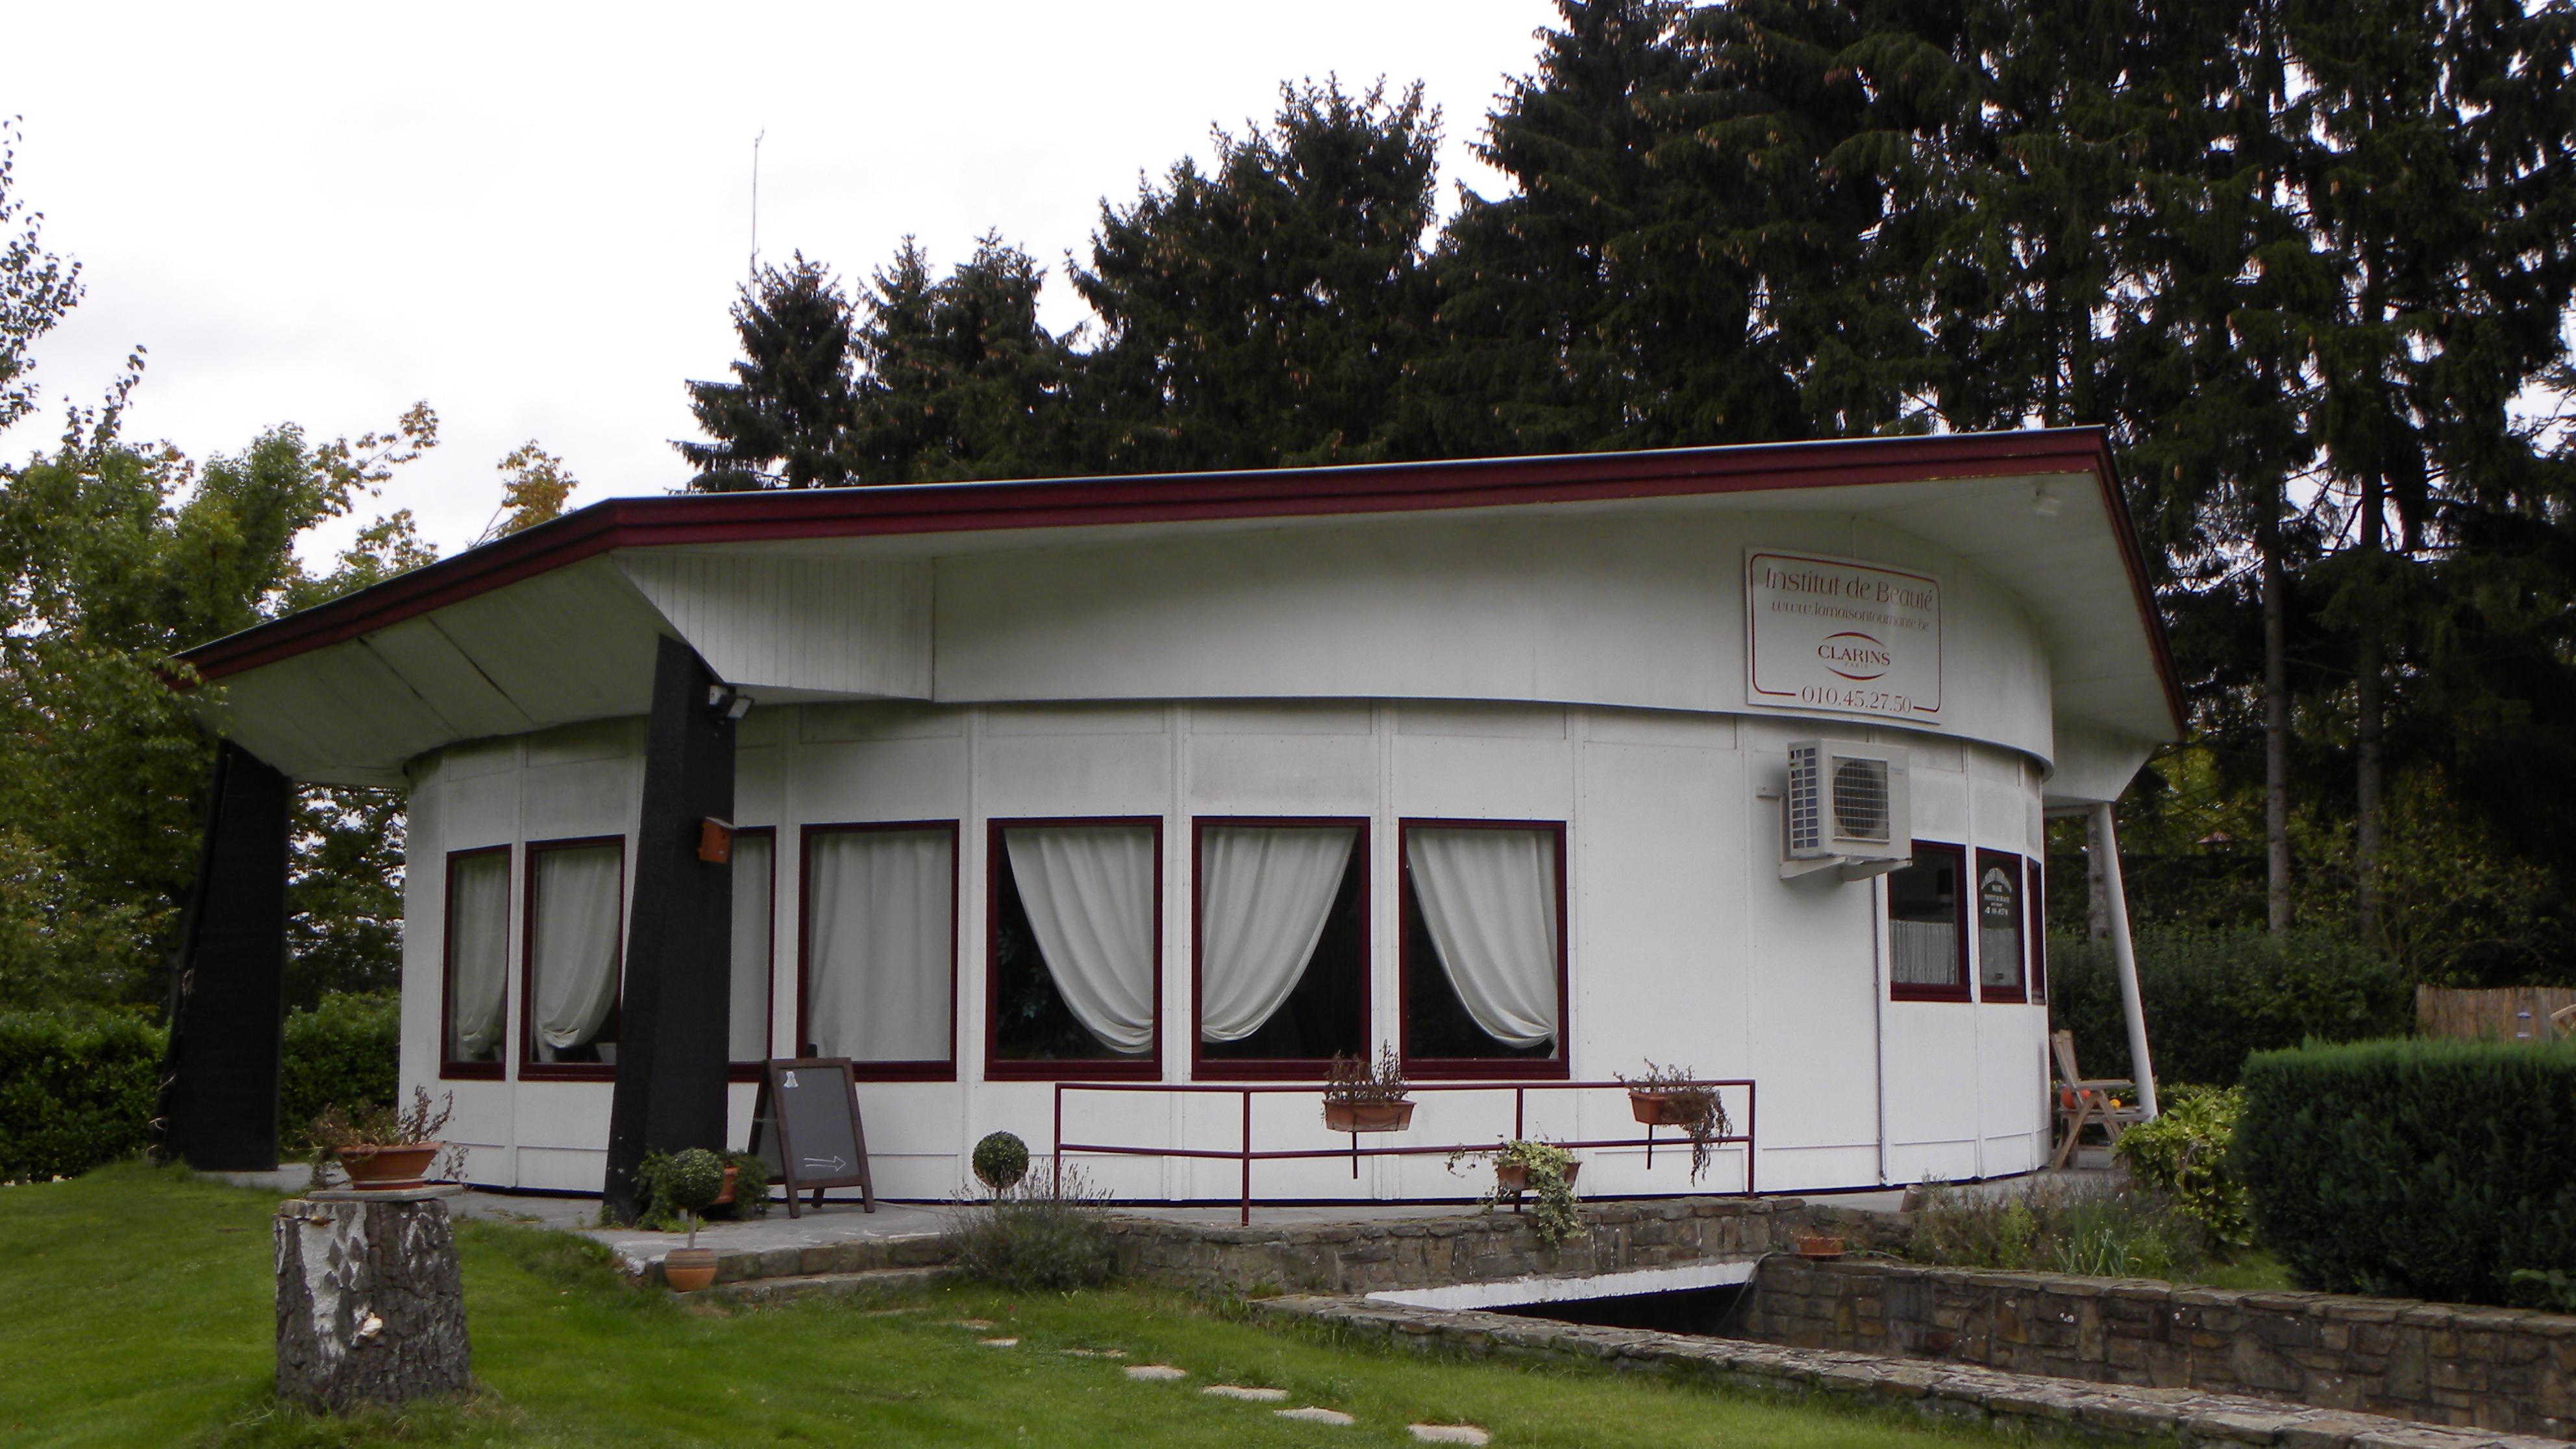 File maison tournante wavre en brabant wallon belgique jpg wikimedia co - Maison abandonnee belgique ...